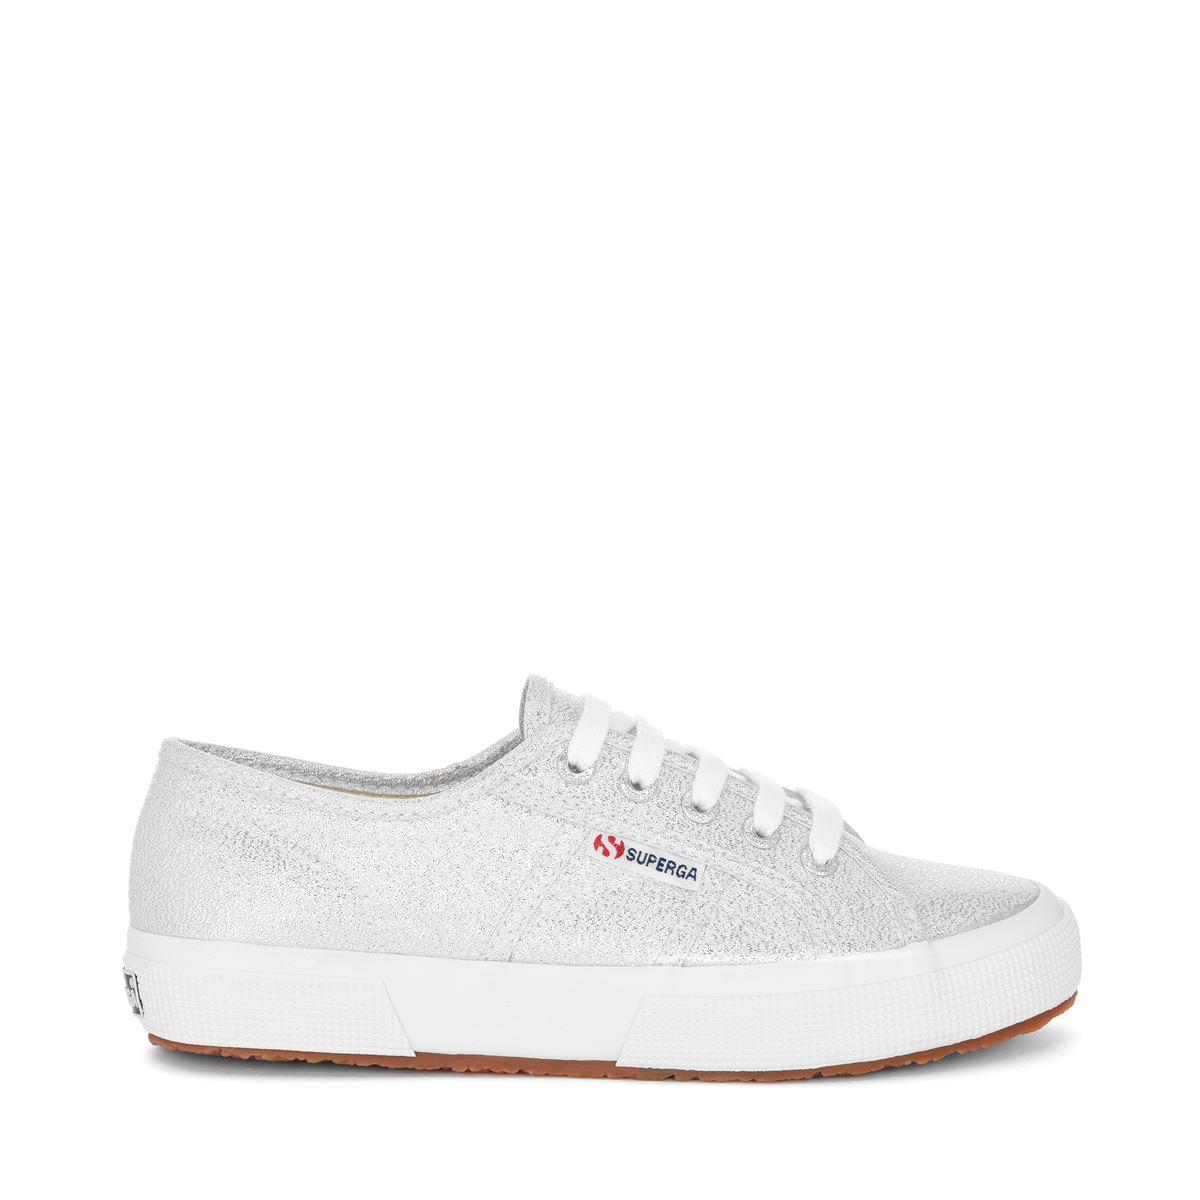 Superga LE SUPERGA 2750-LAMEW Woman Sneaker